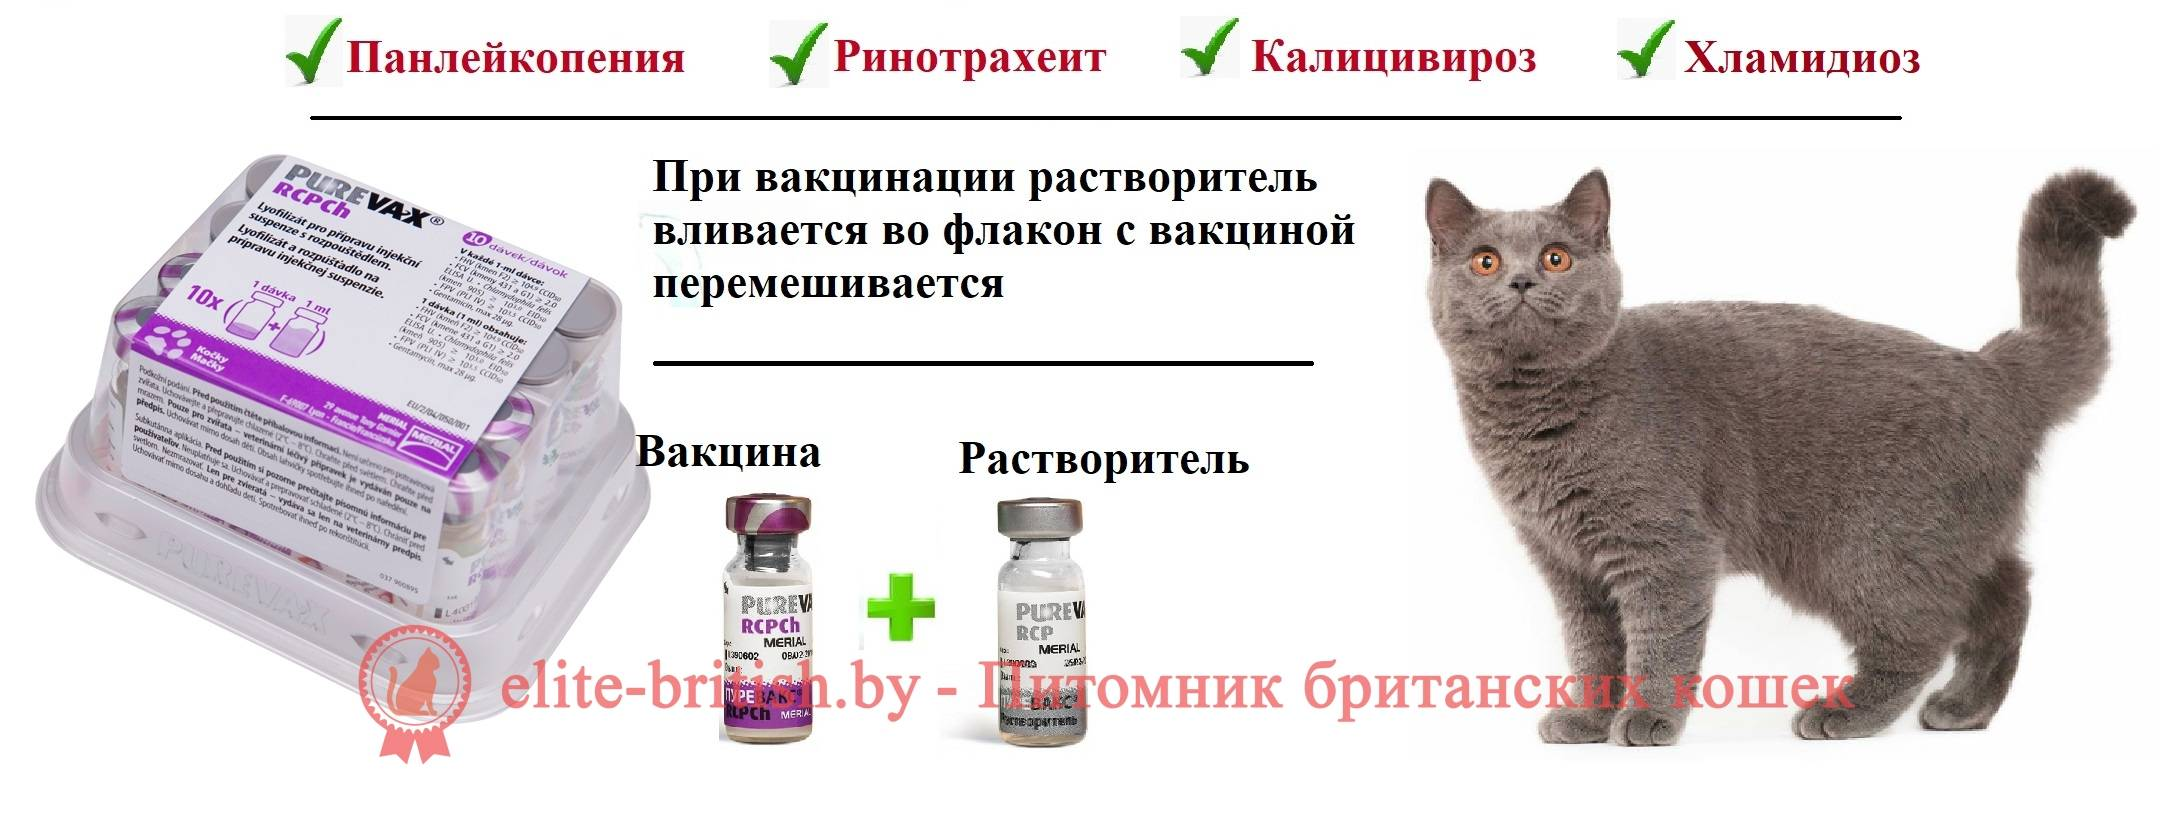 Всё о прививке кошке от бешенства